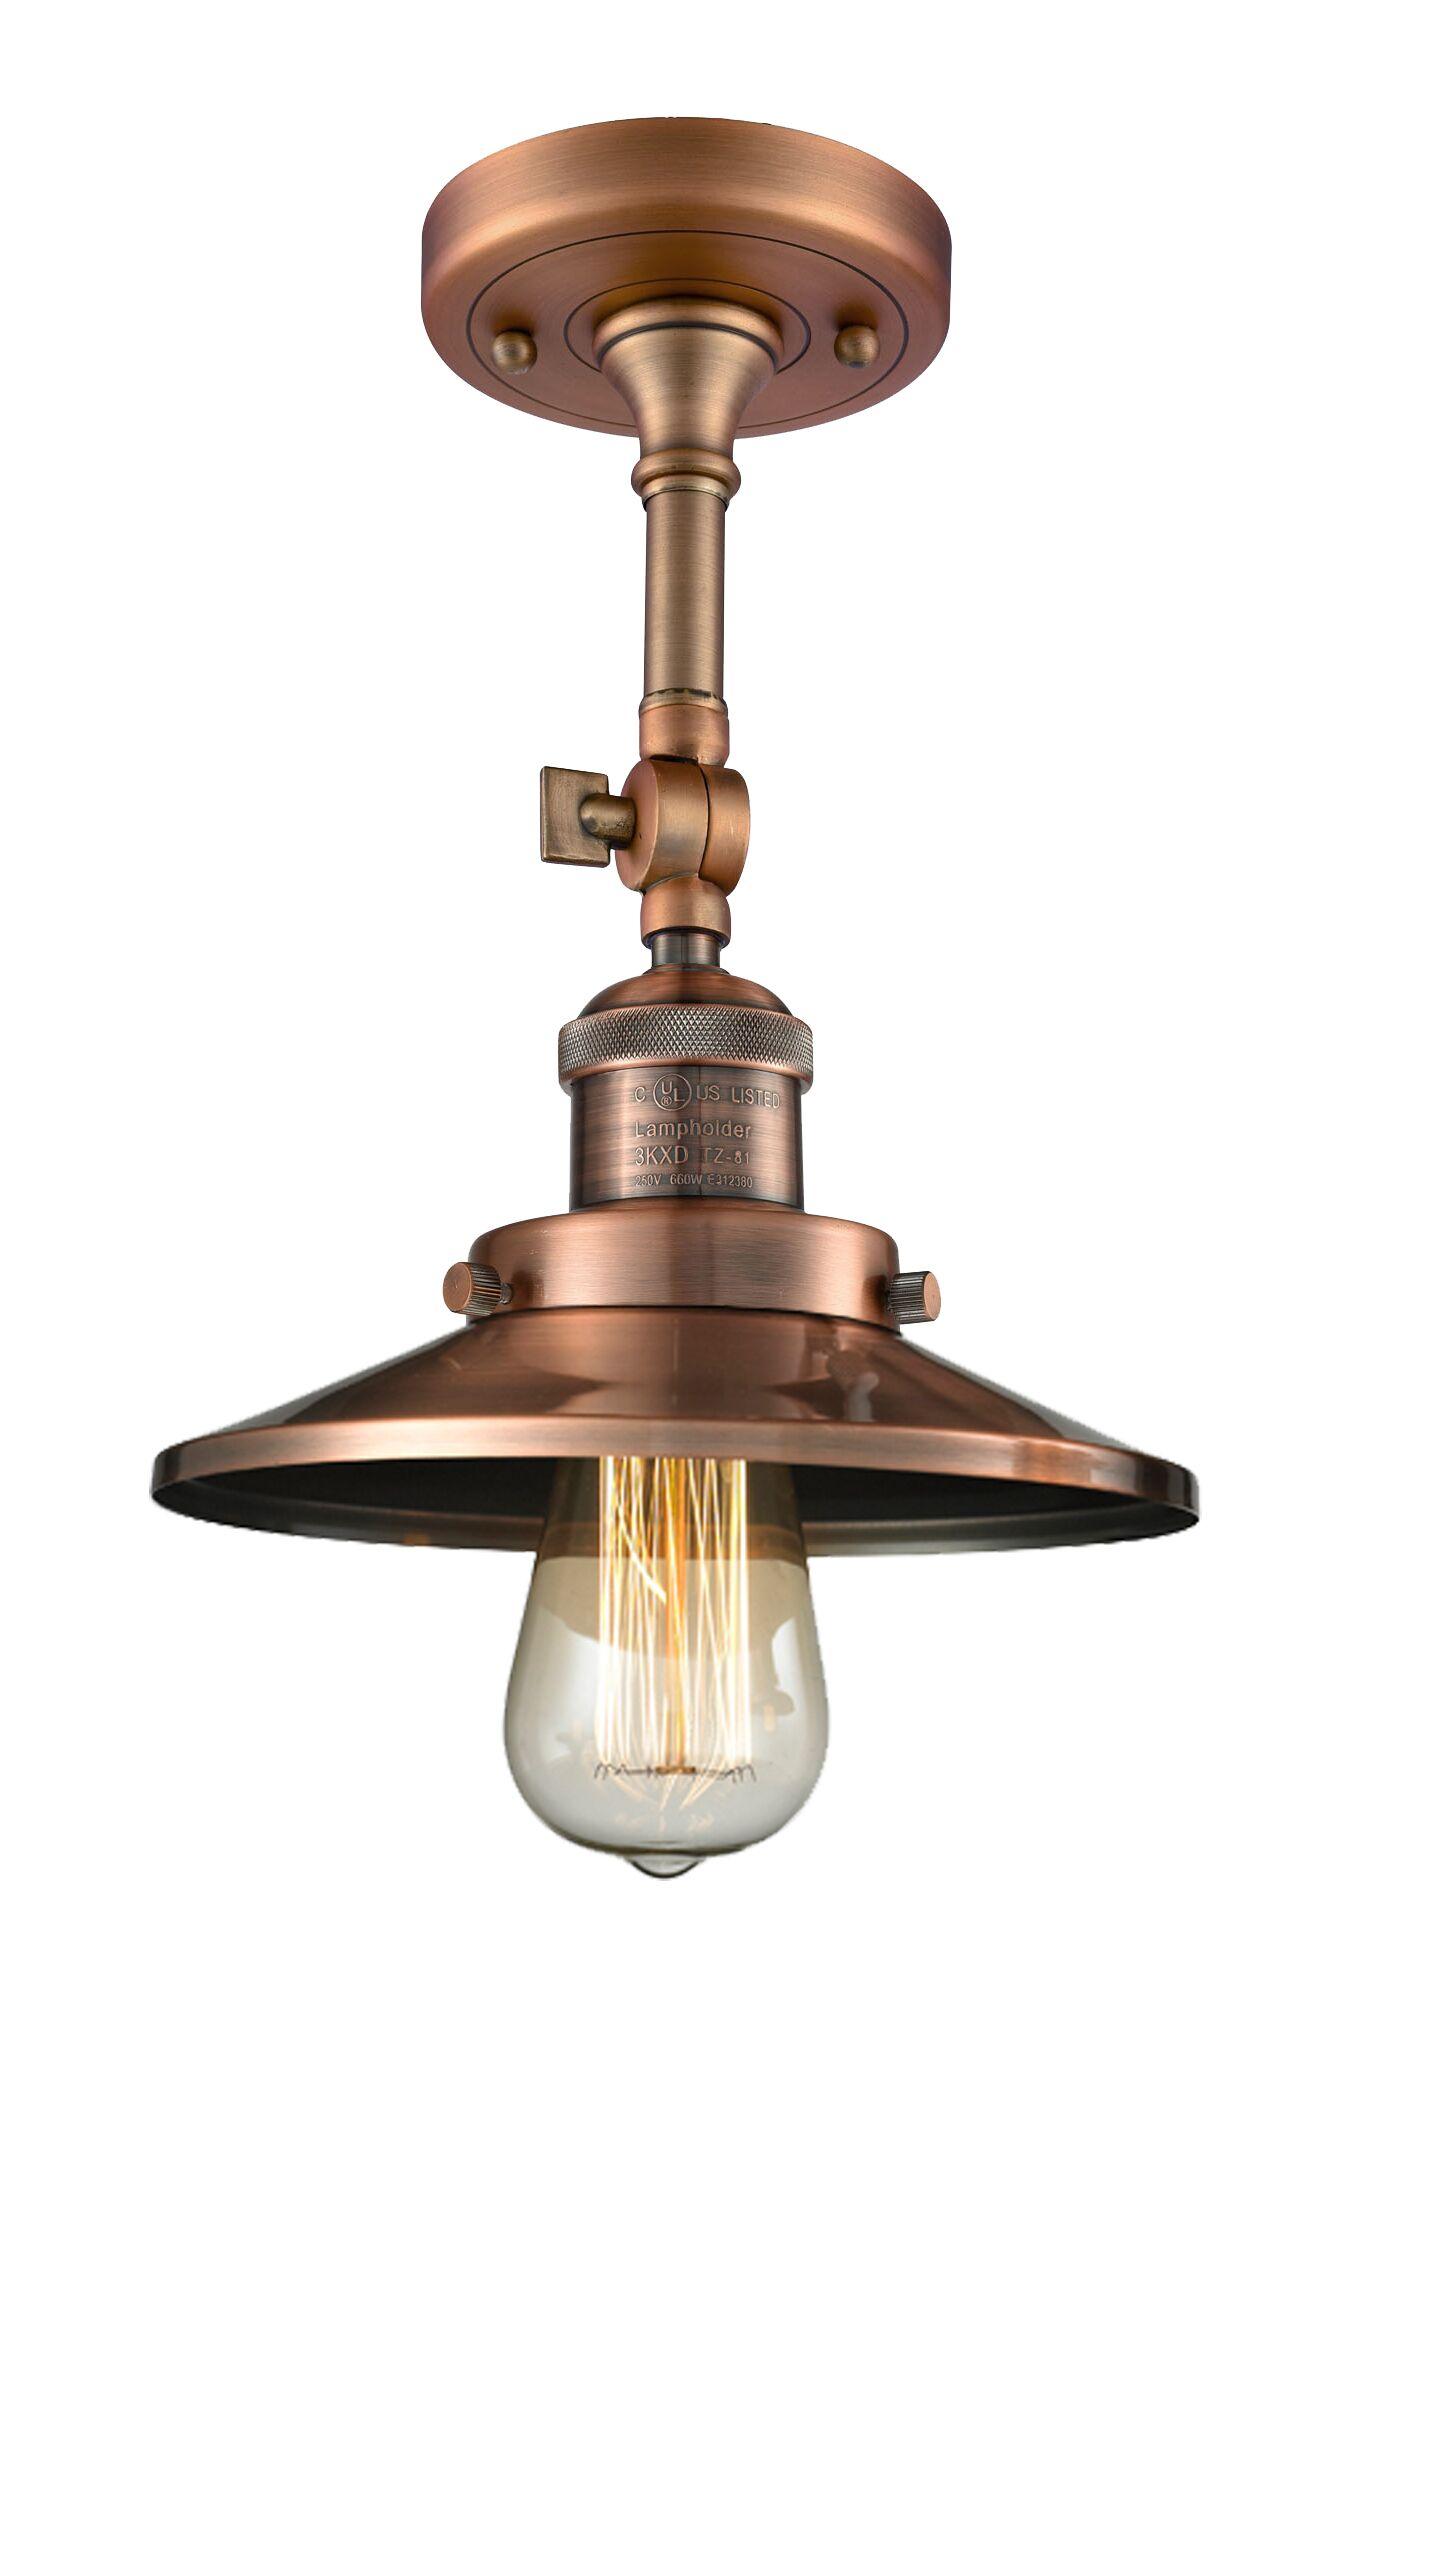 Mikesell 1-Light Semi Flush Mount Fixture Finish: Antique Copper